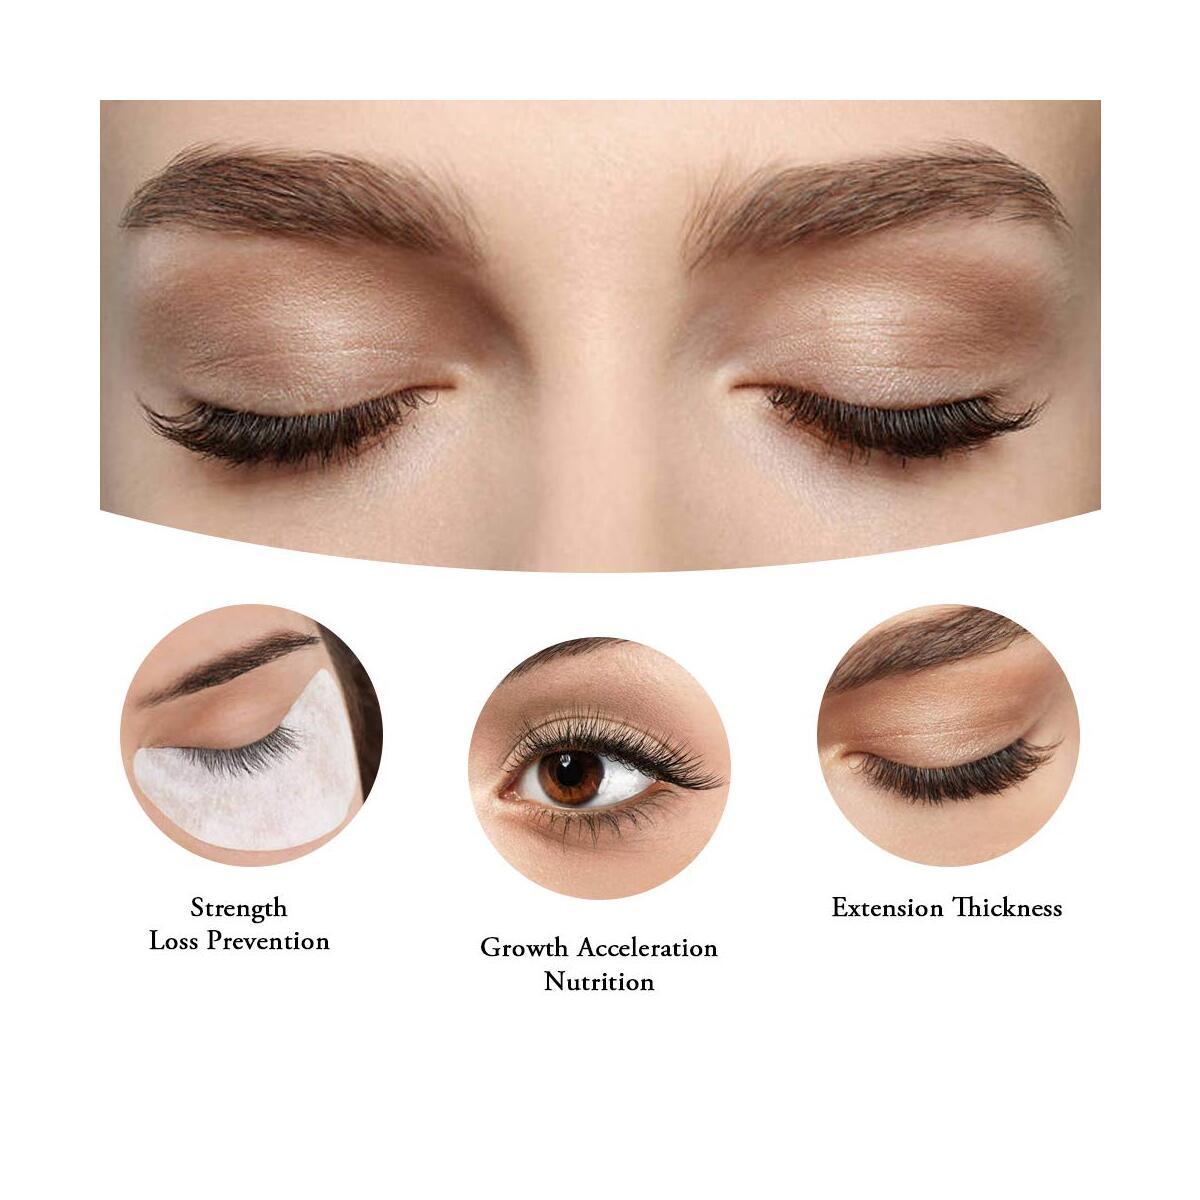 Eyebrow & Eyelash Growth Serum | Advanced Eyelash Conditioner Boost Lash Grow Enhancer | Powerful Brow & Lash Enhancing Formula for Longer, Thicker Eyelashes and Eyebrows-0.17fl.oz/5ml